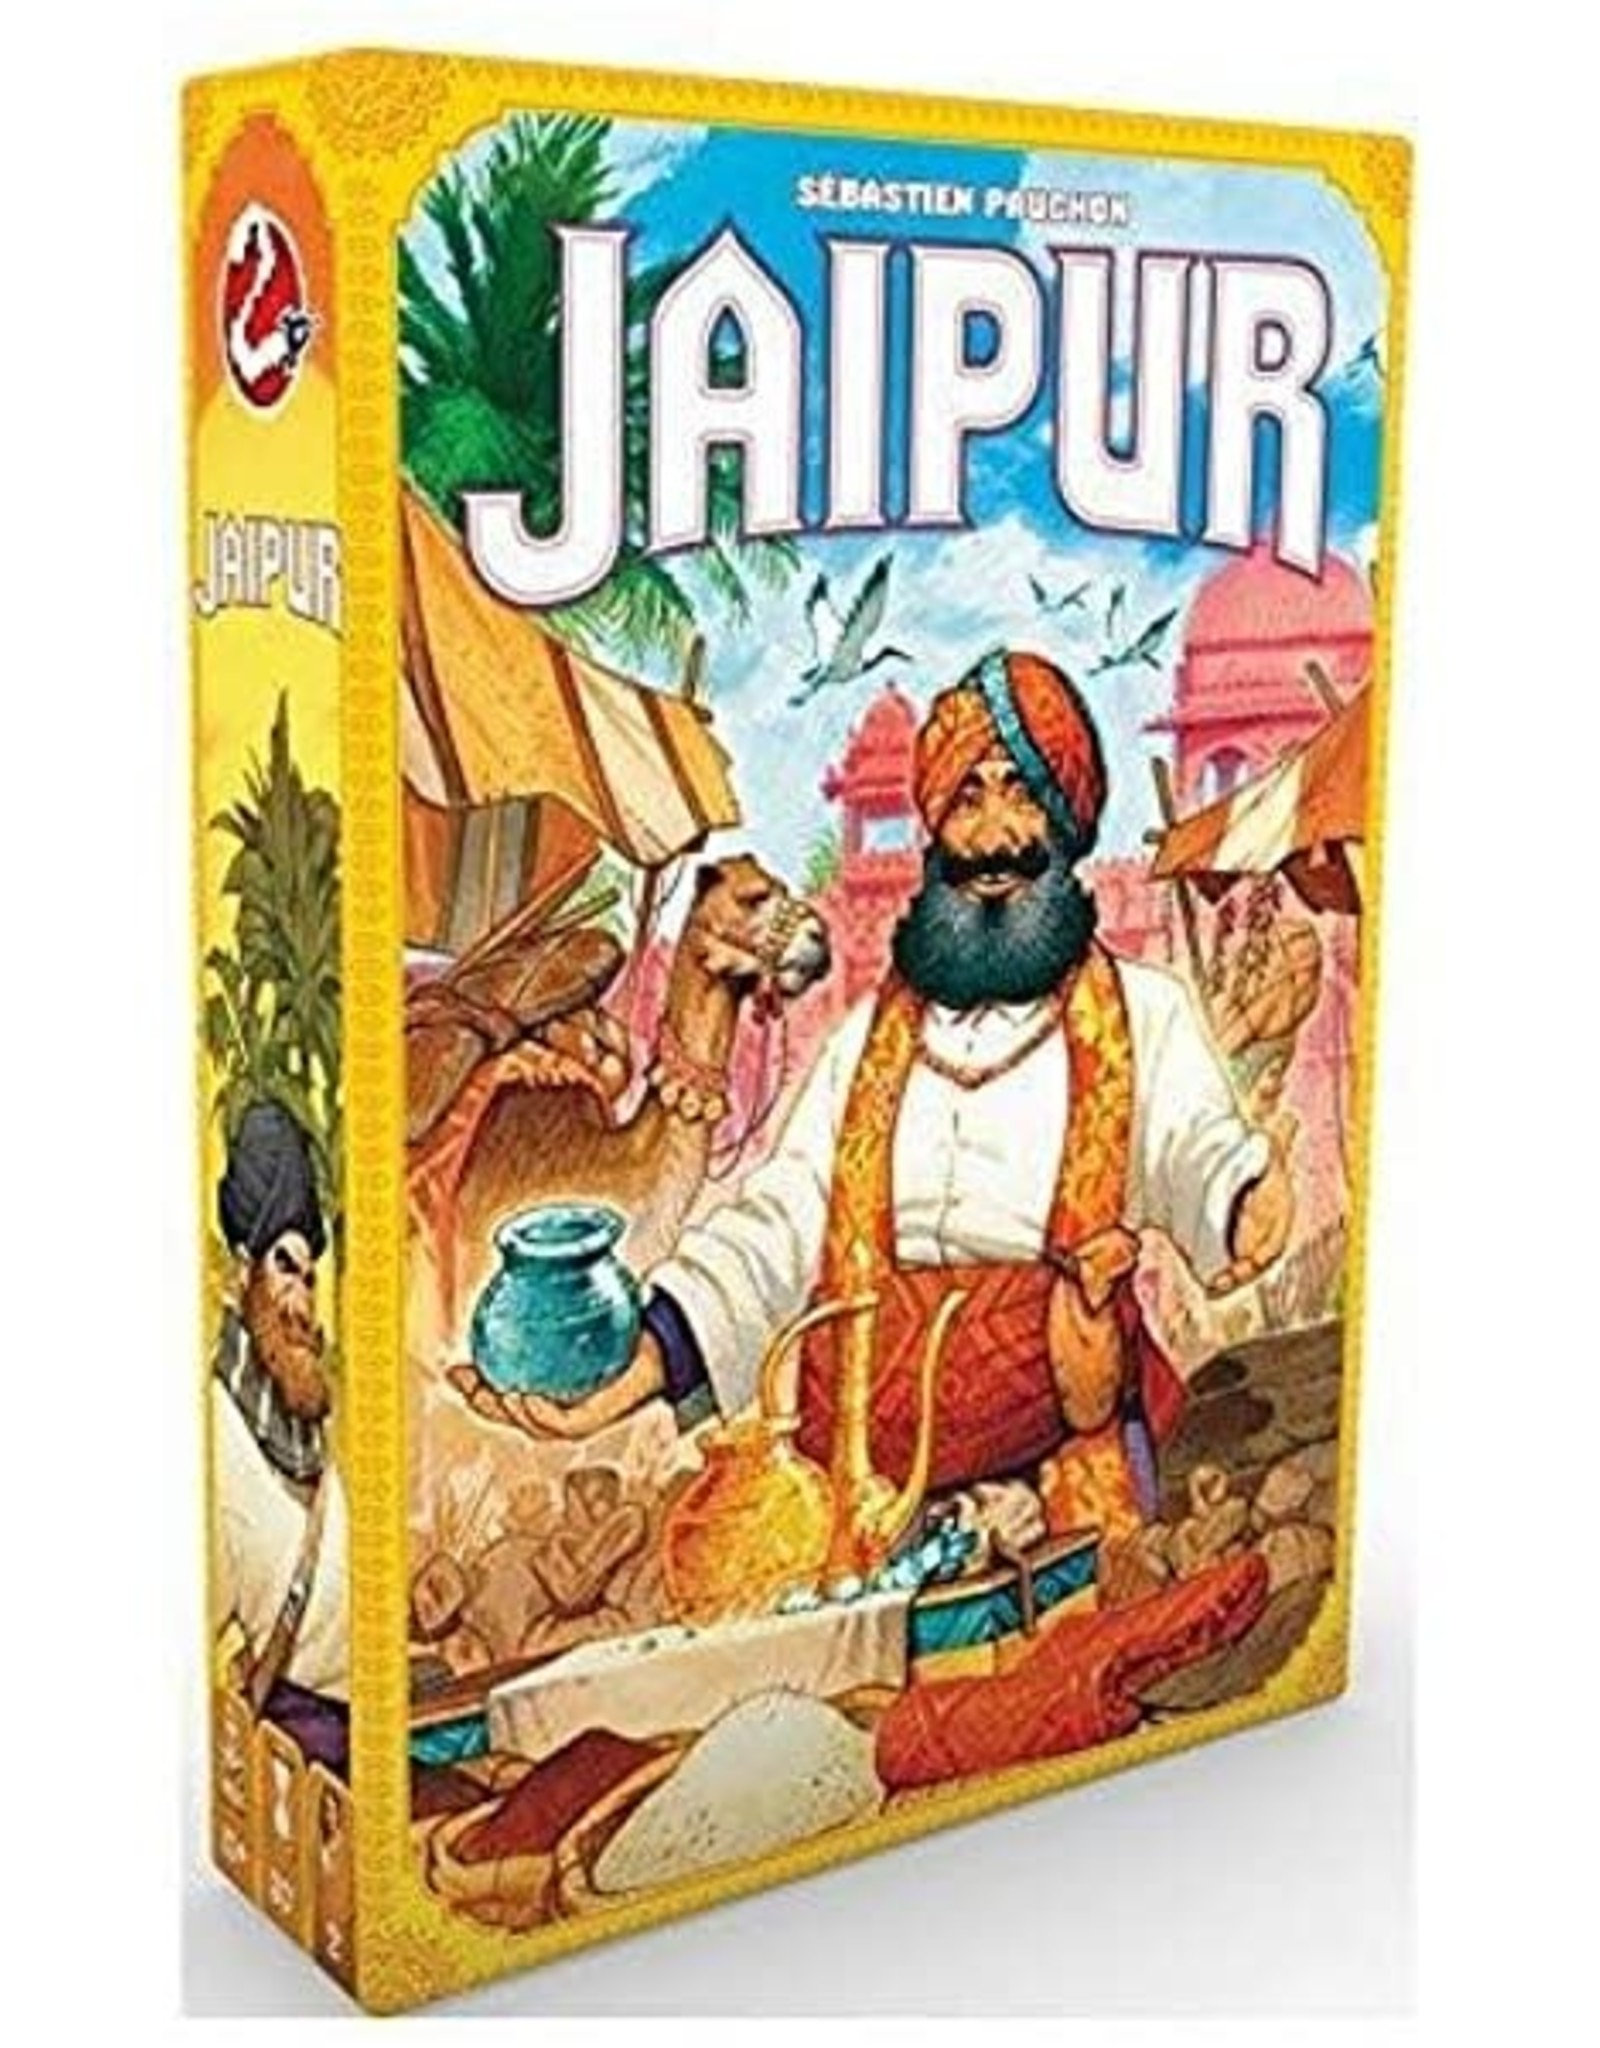 Space Cowboys Jaipur (New Edition)